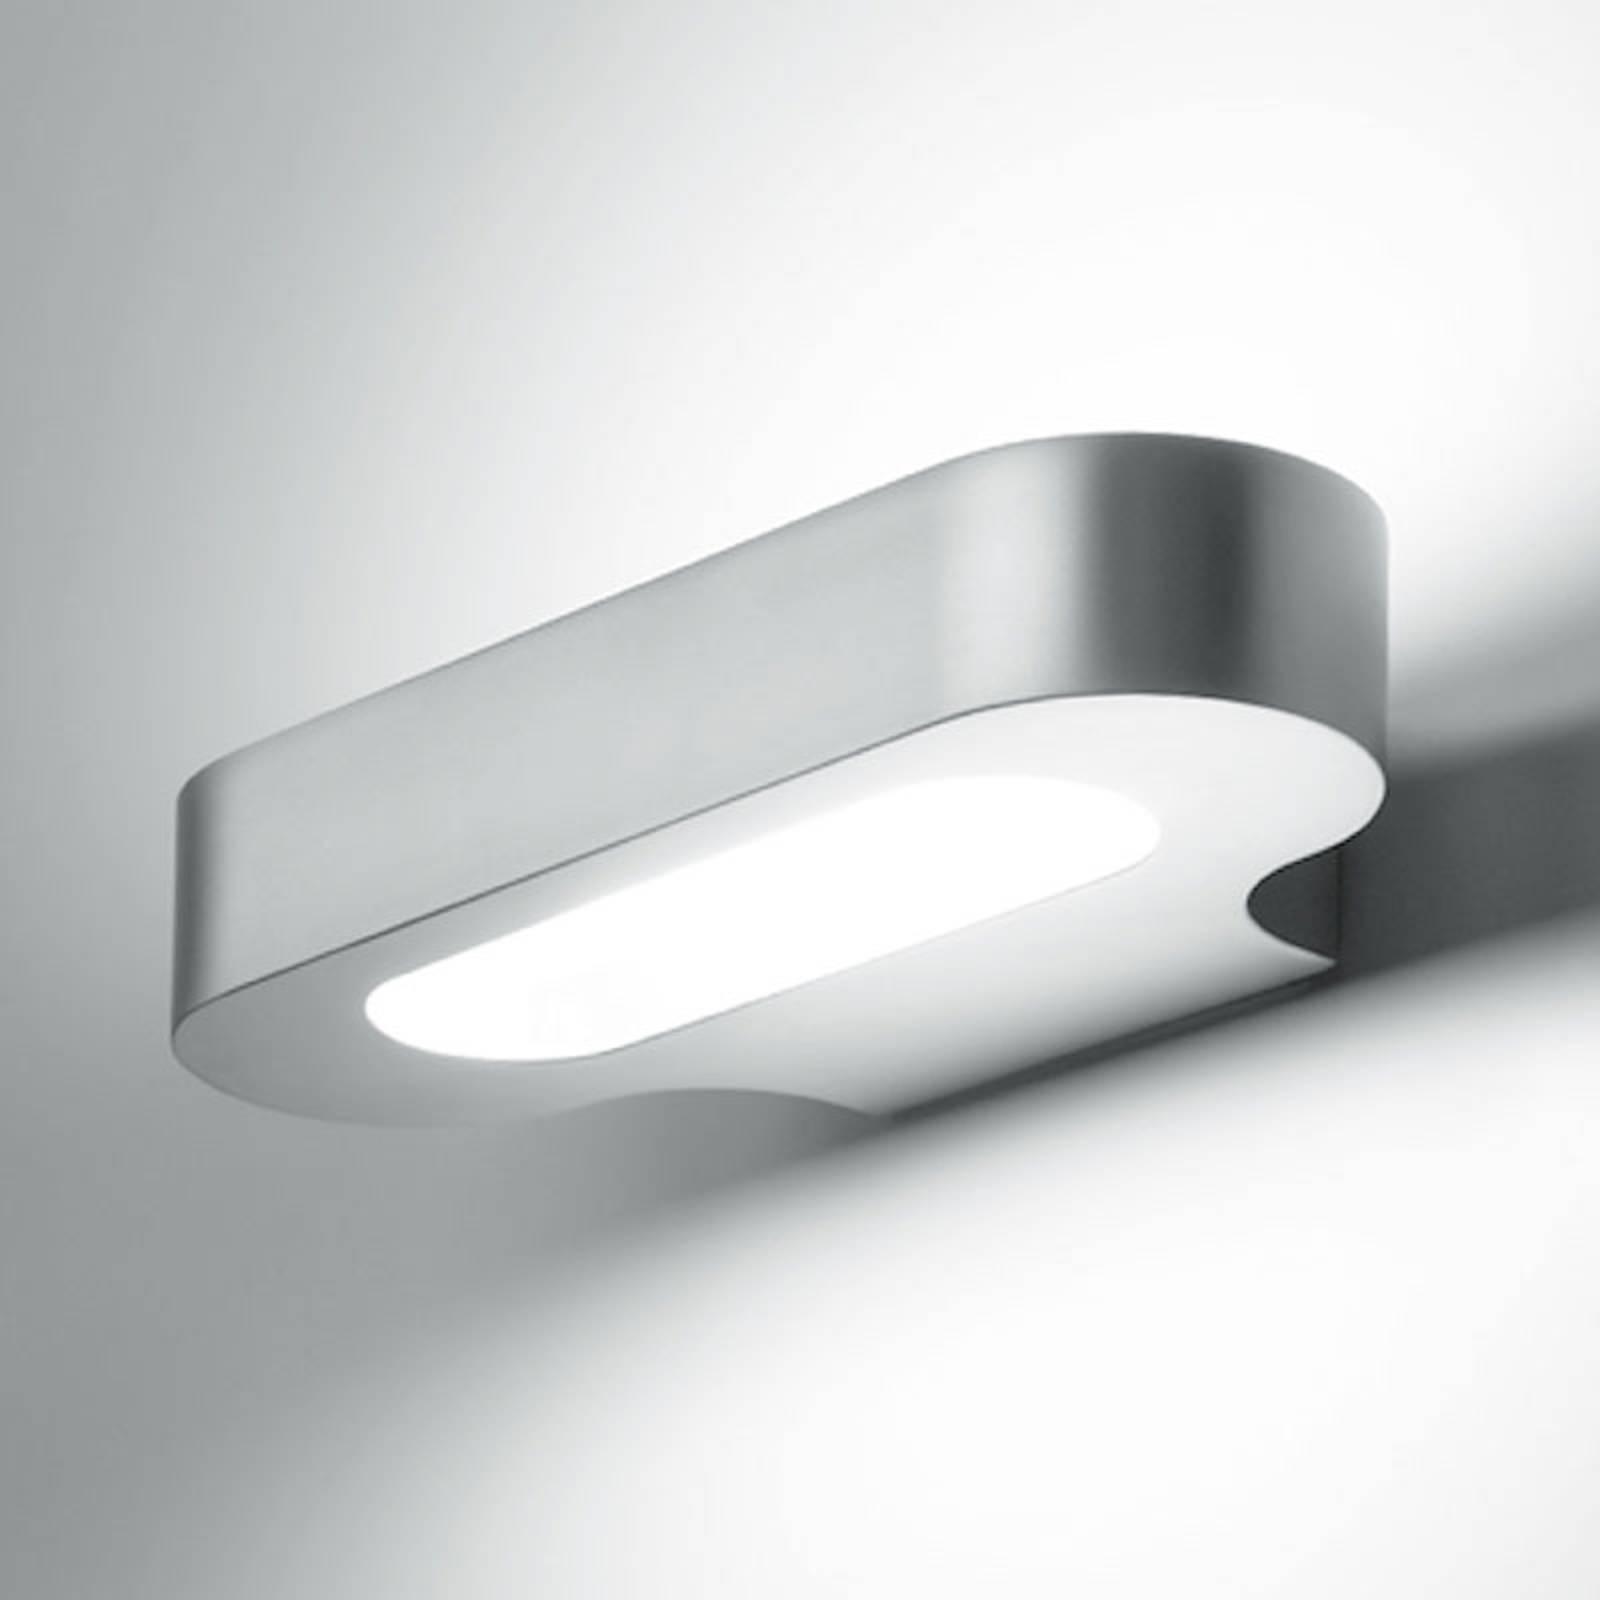 Artemide Talo LED-Wandleuchte 21 cm silber 3.000 K